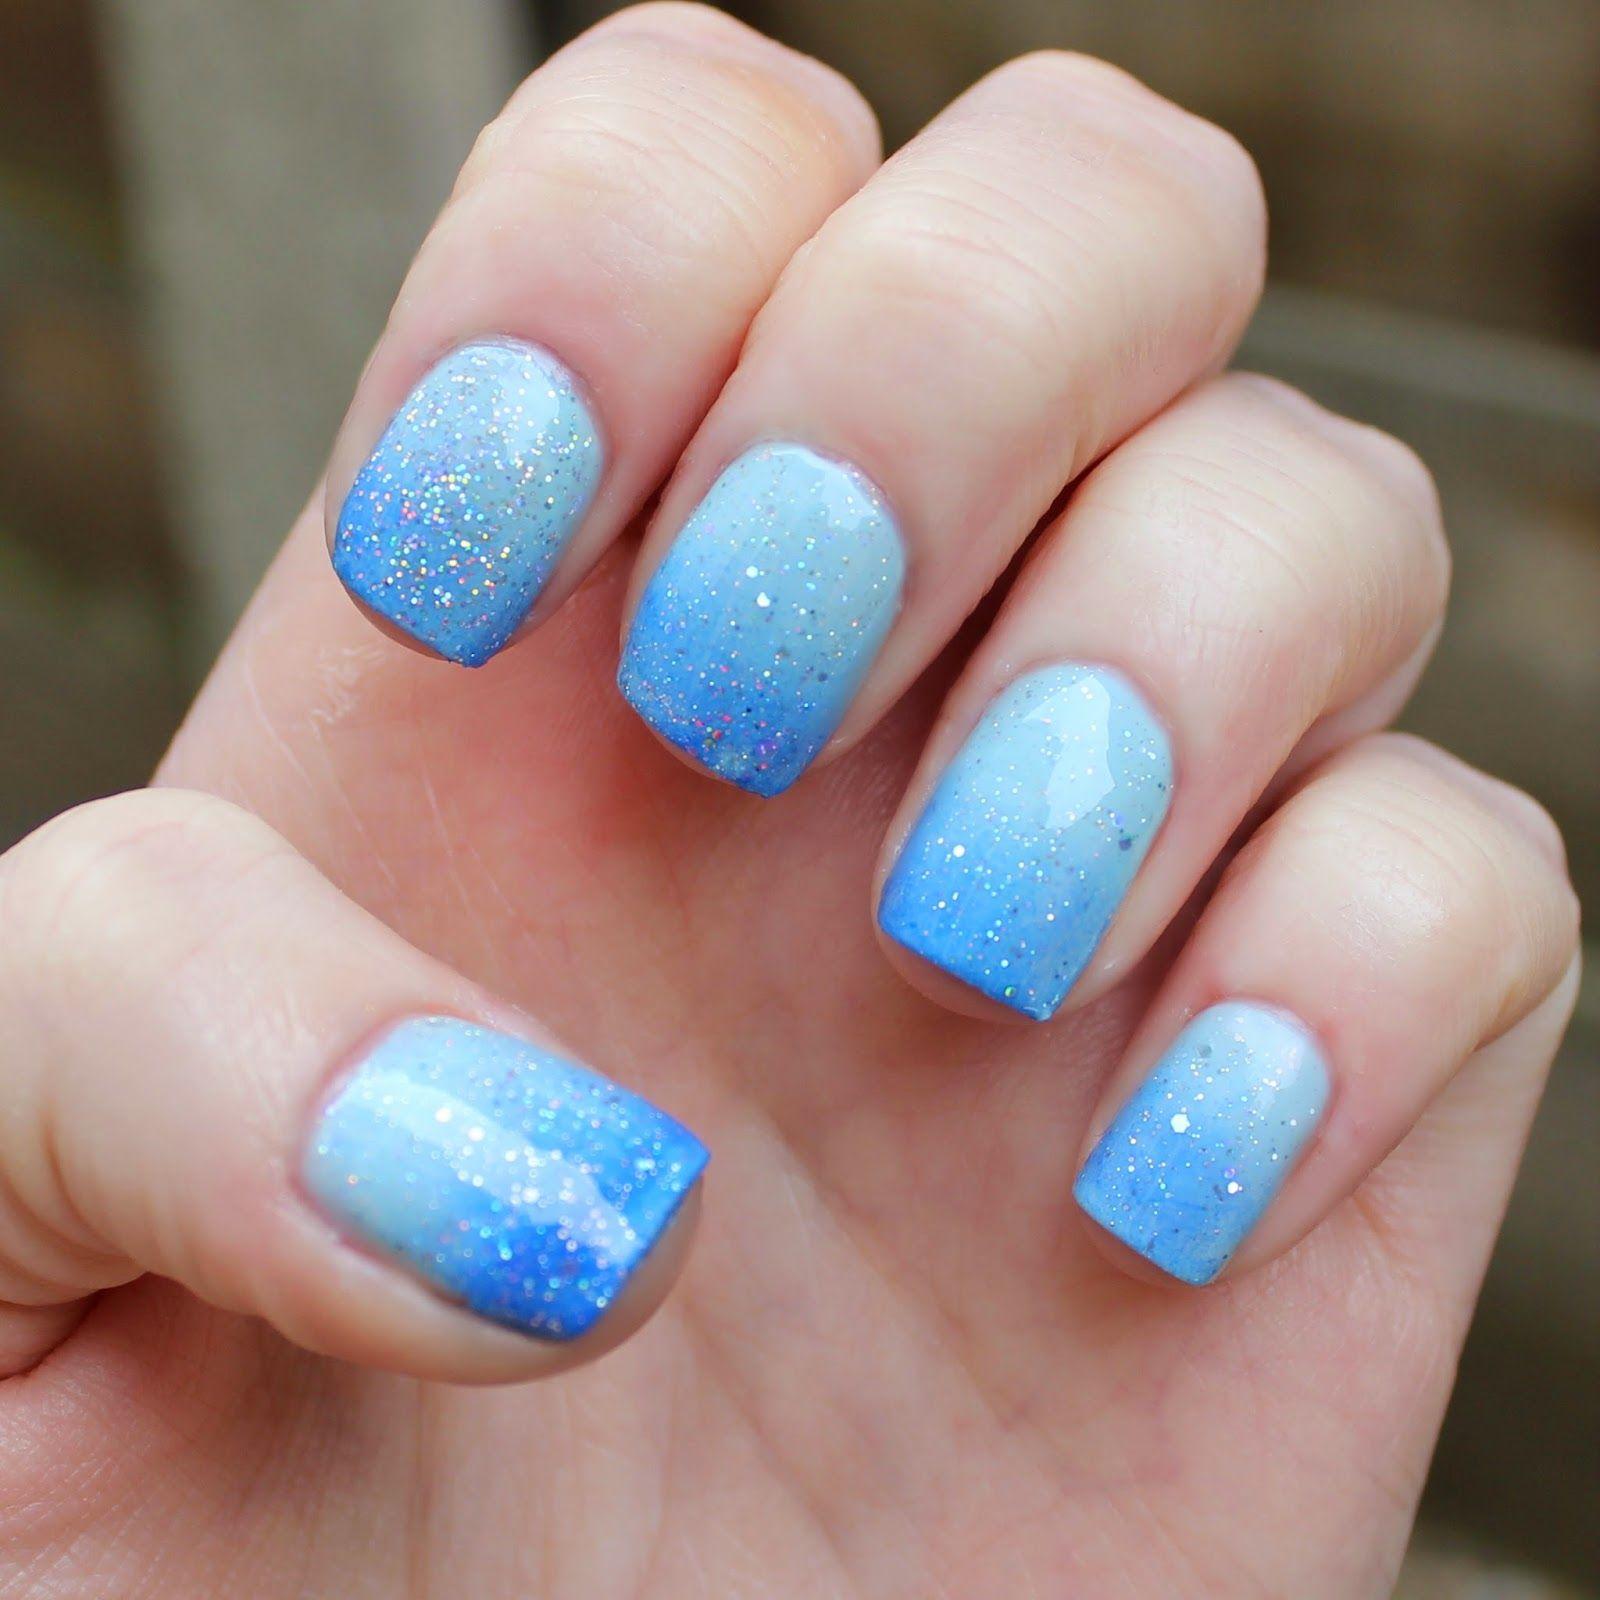 Cinderella Nail Art   Nails   Pinterest   Cinderella nails ...